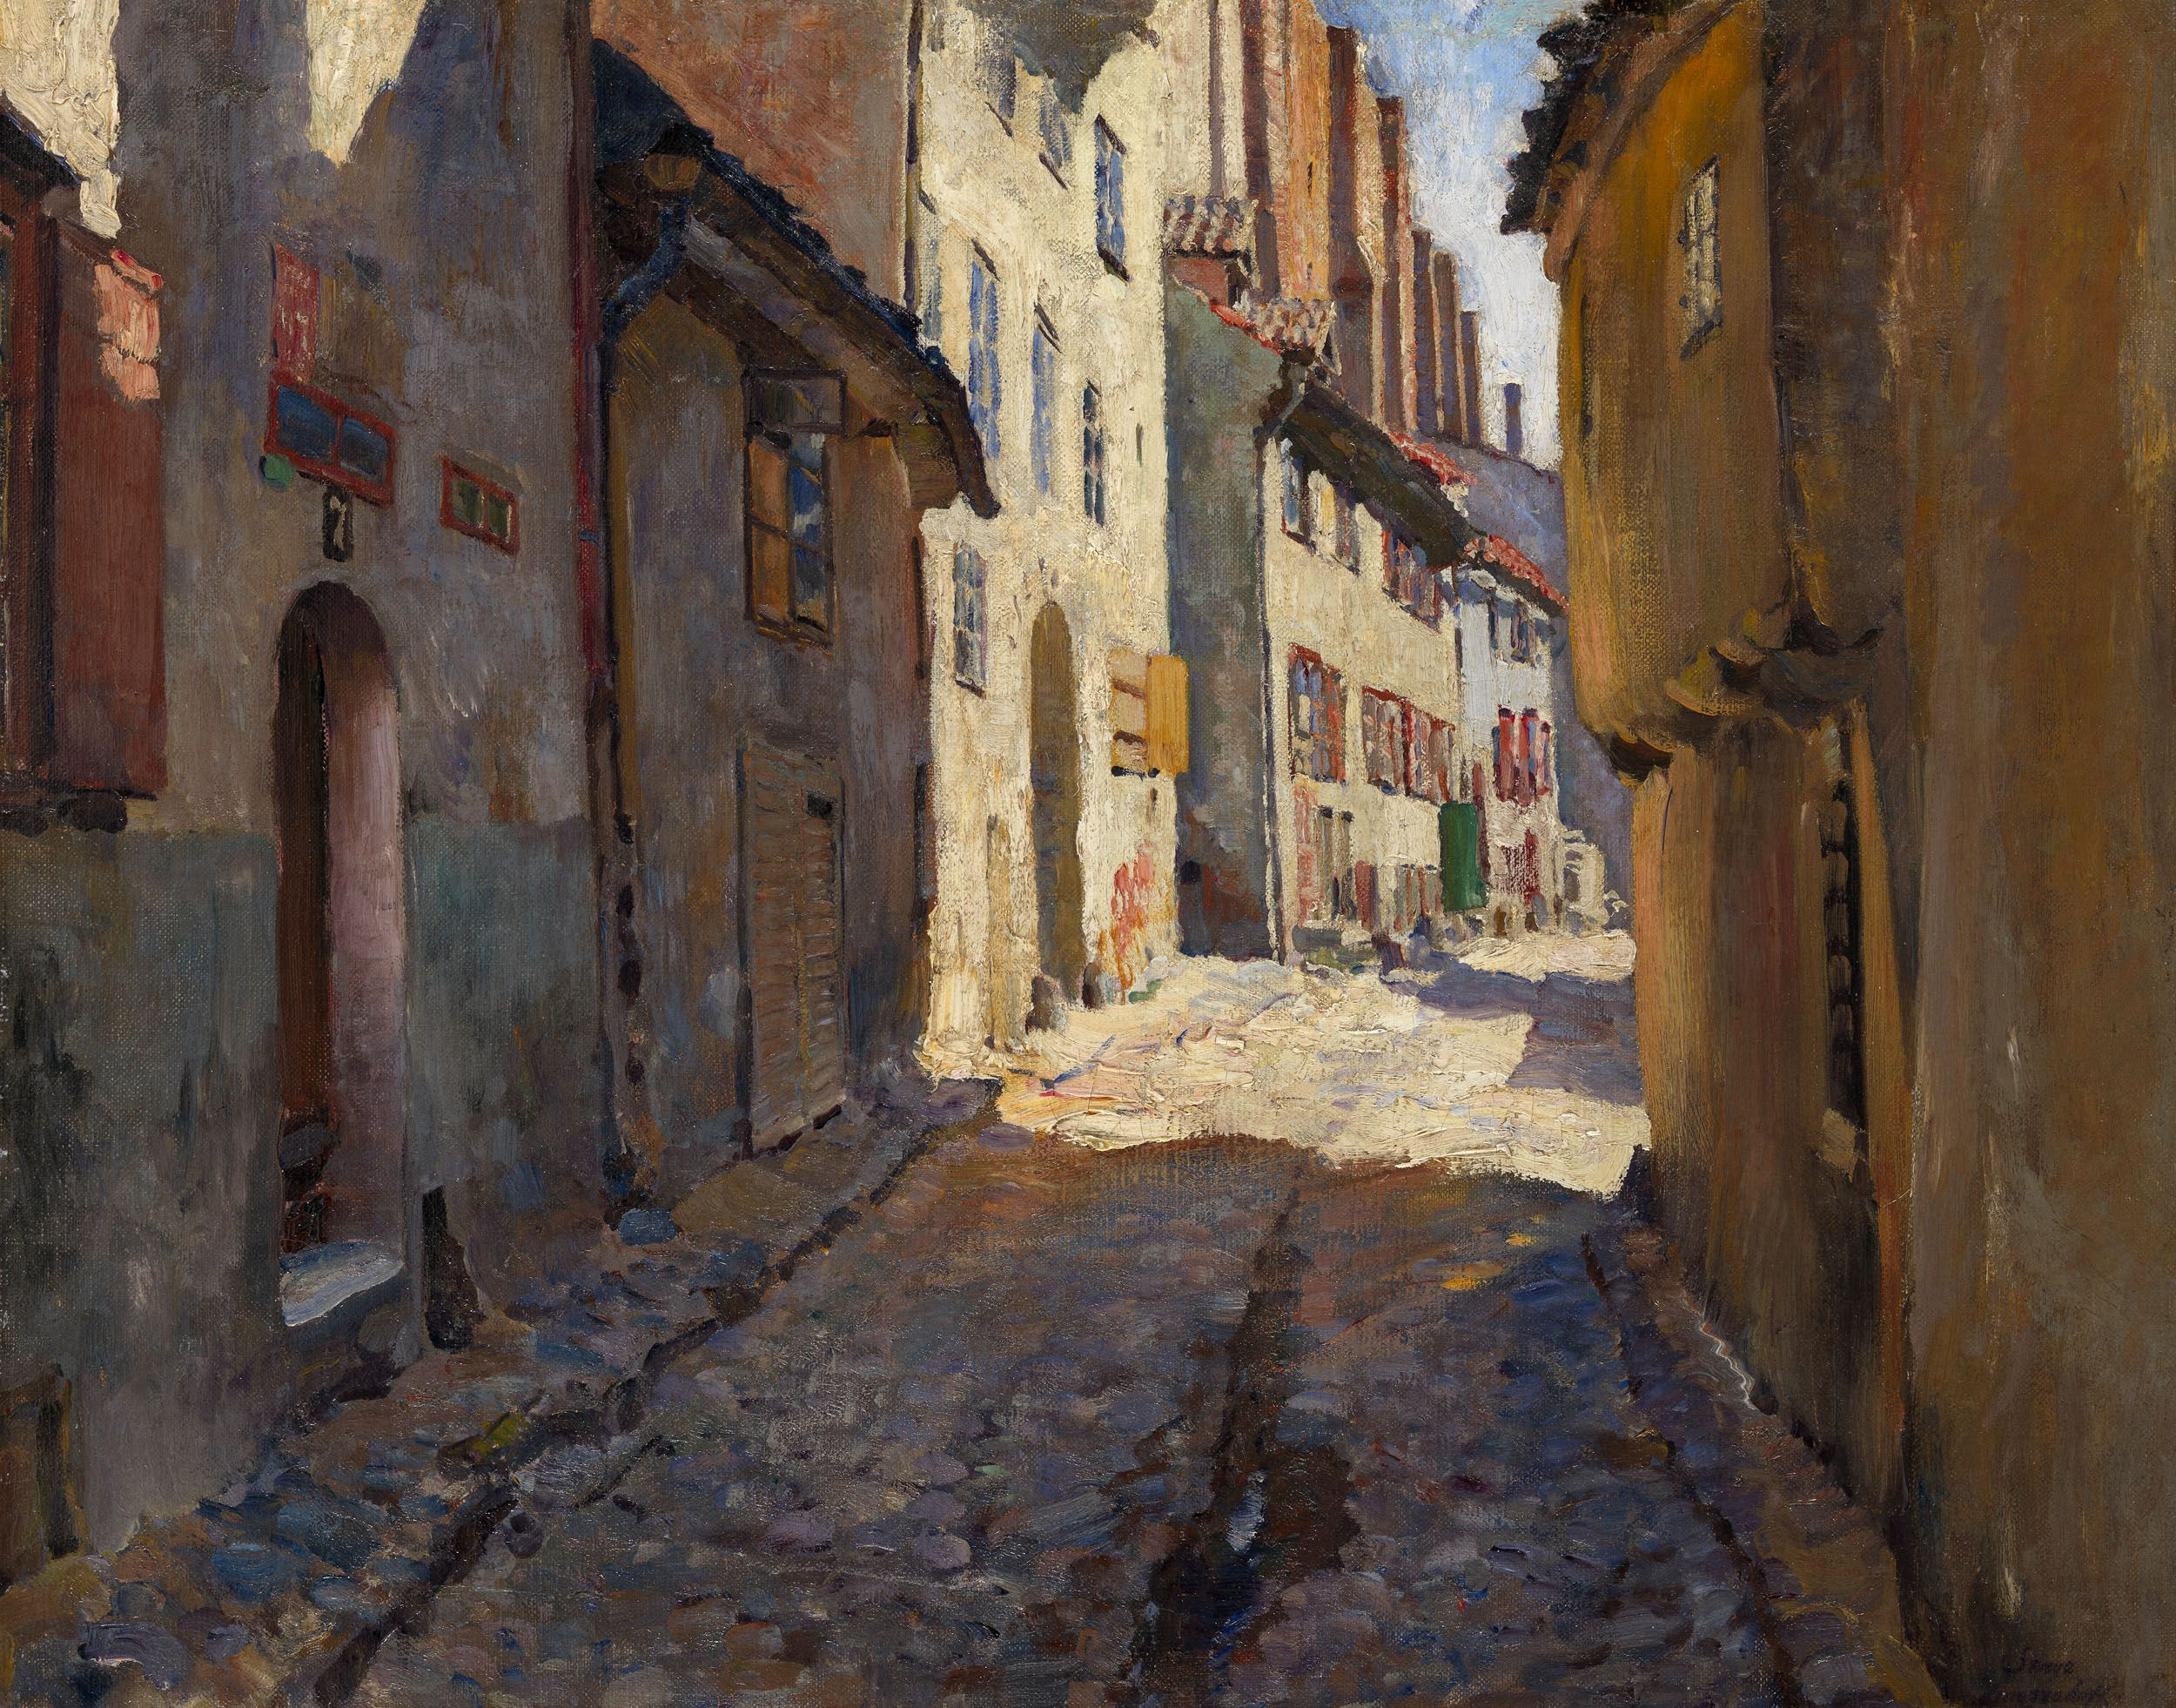 Narrow Street in Riga Sergei Arsenevich Vinogradov - Date unknown |  Peinture, Tableau, Coups de pinceau